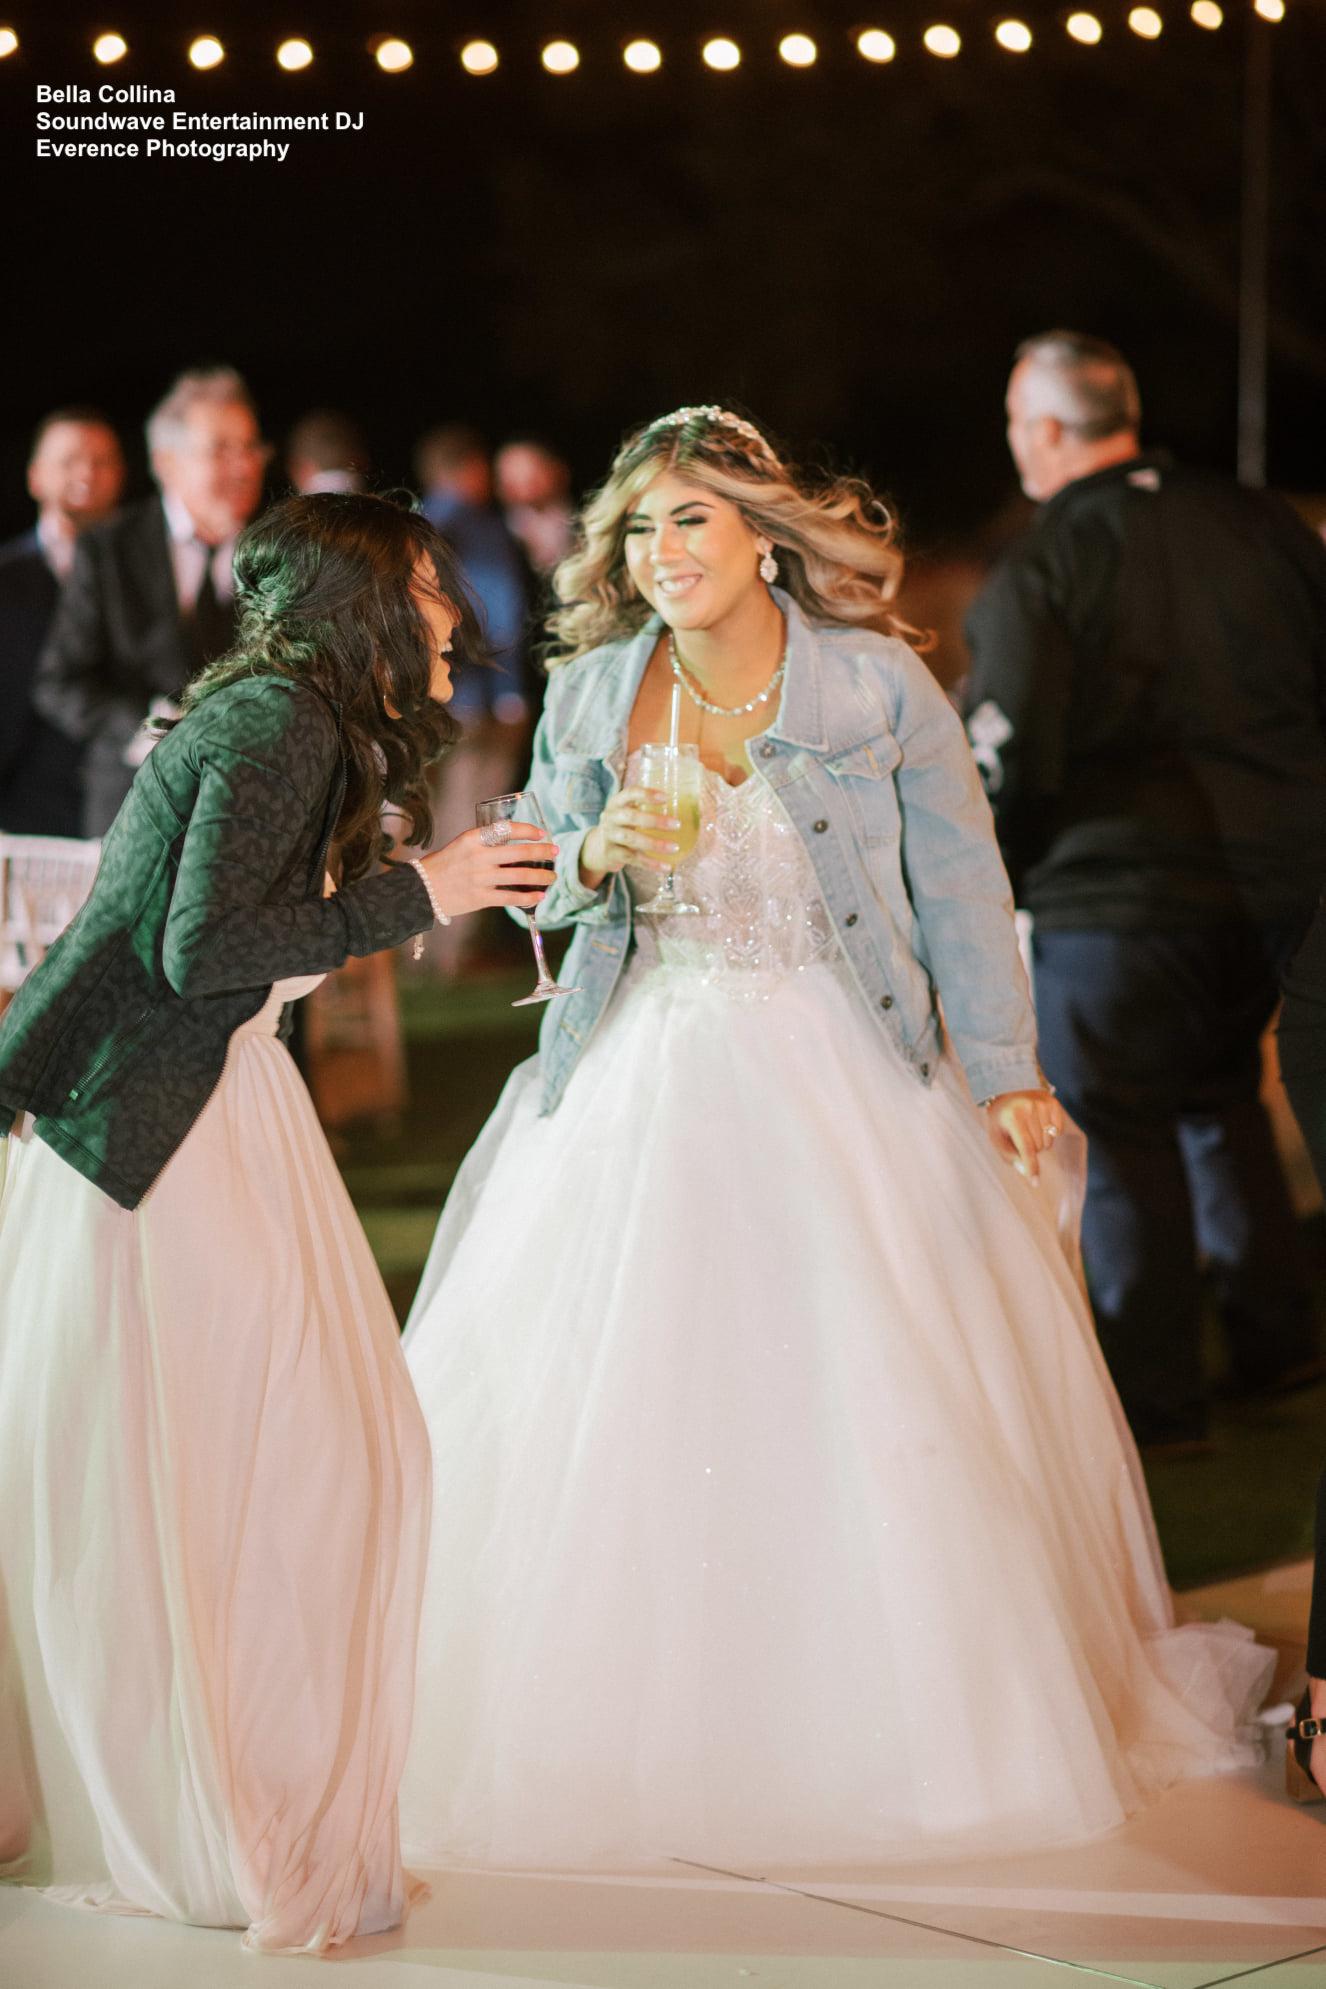 Bride Dance Floor Soundwave DJ Bella Collina